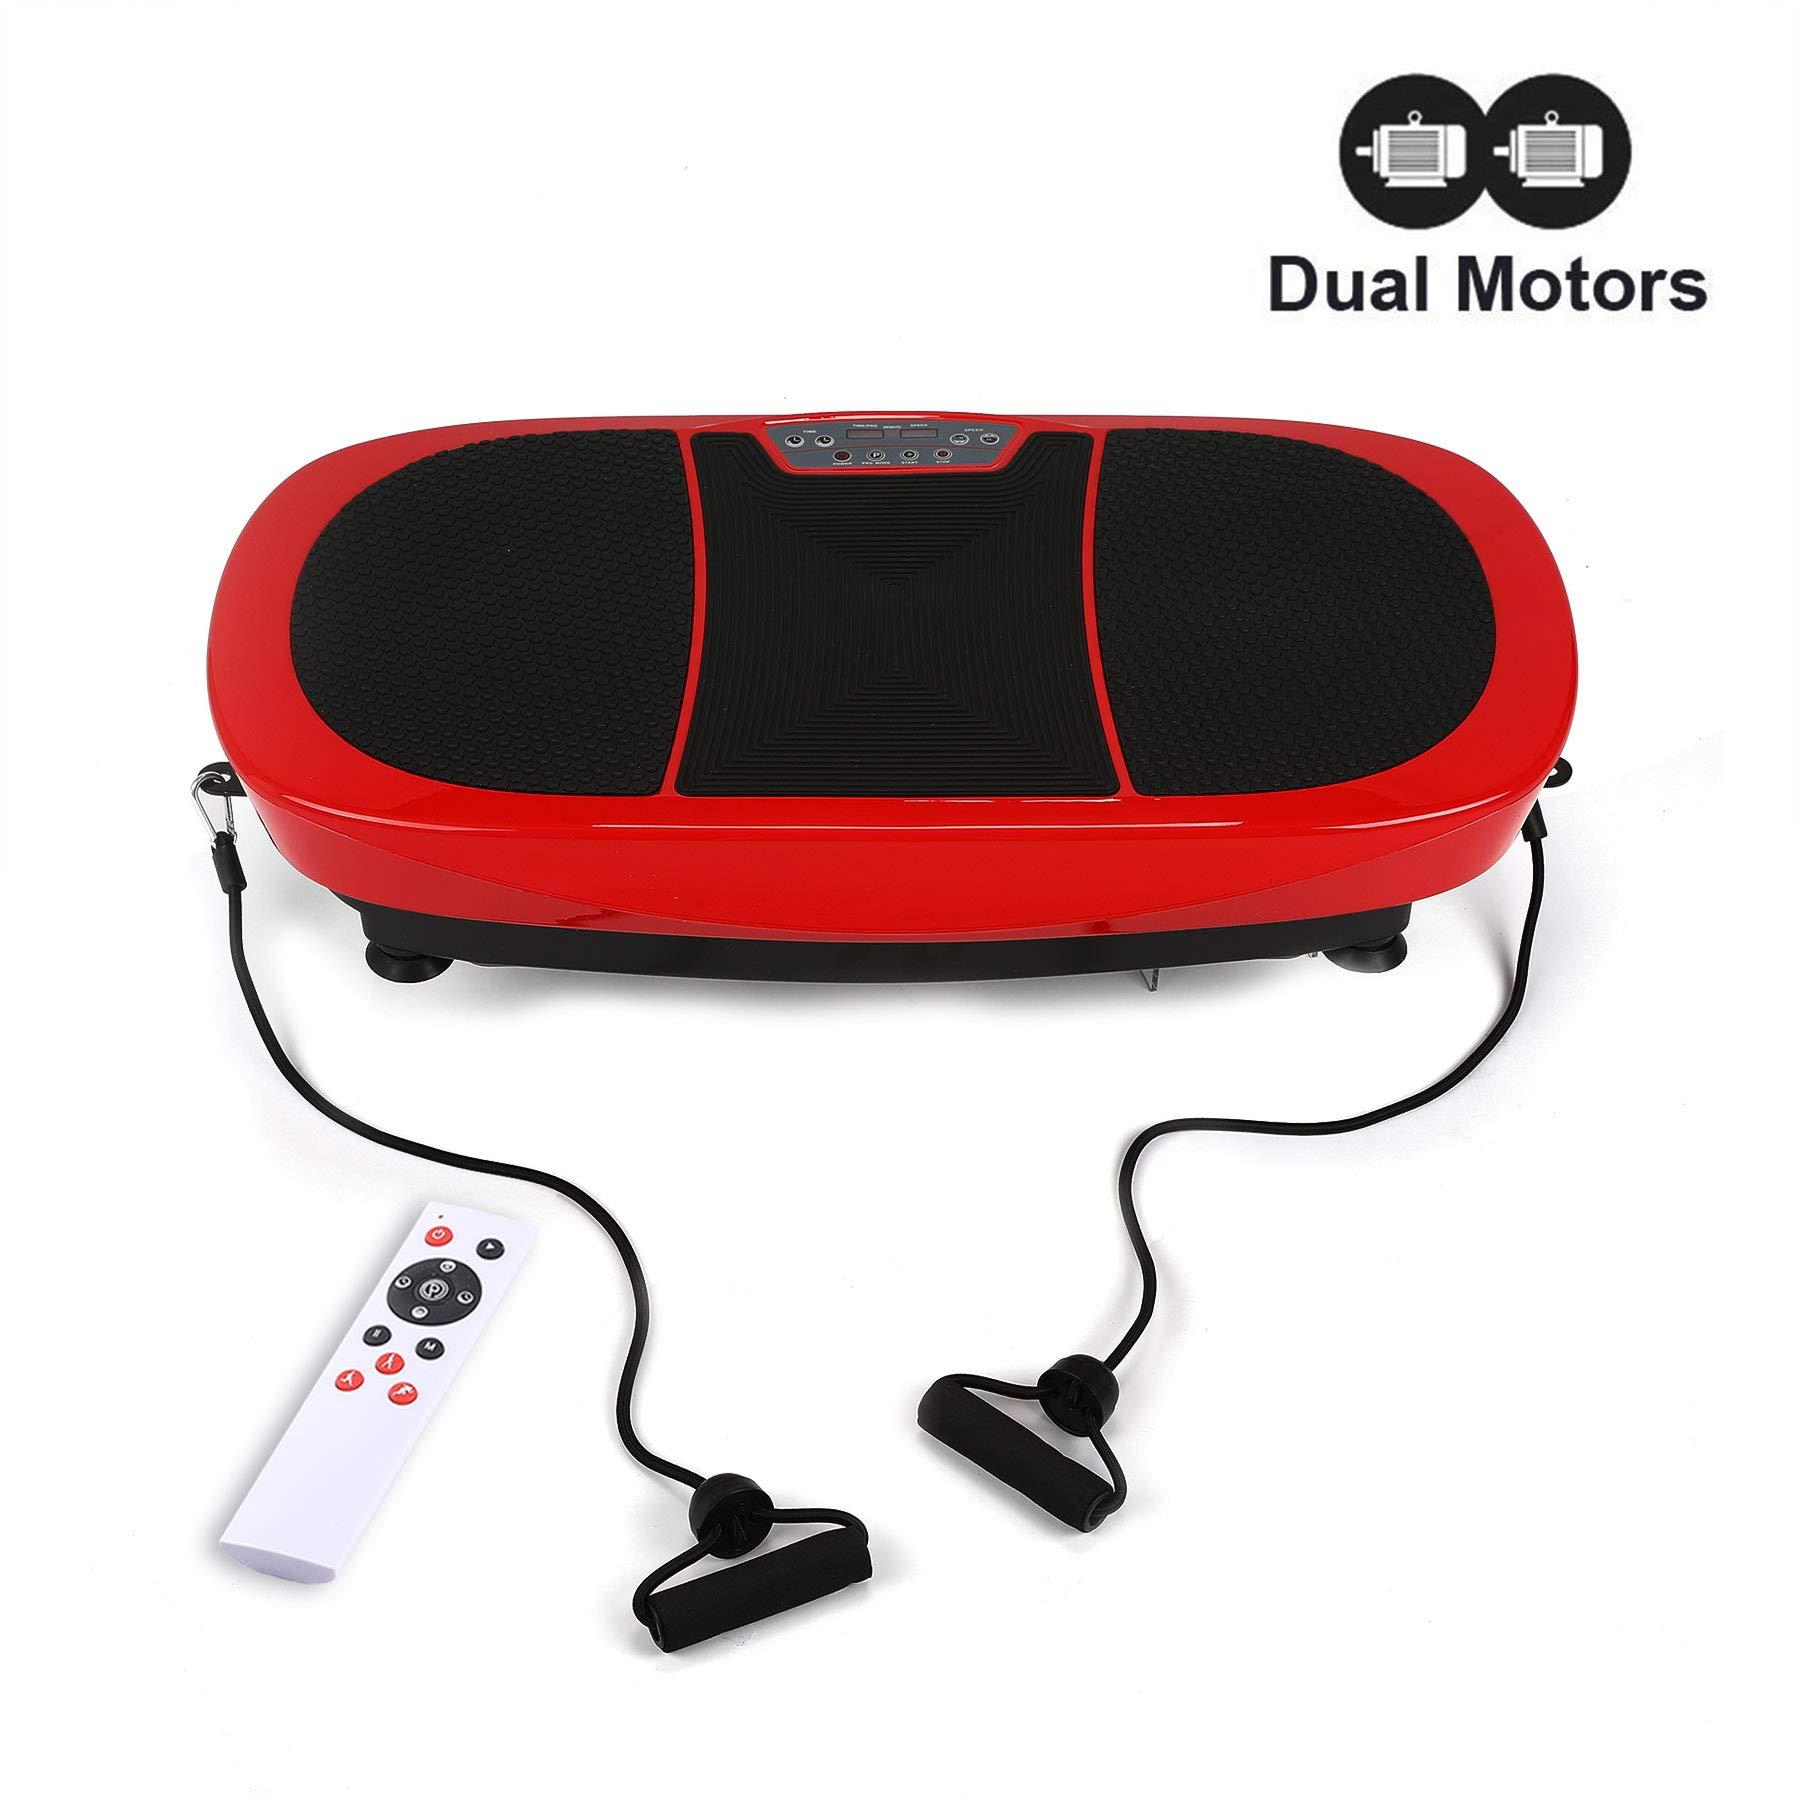 Z ZELUS 3D Fitness Whole Body Vibration Platform Machine - 400W Dual Motors Vibration Plate Crazy Fit Massage Exercise Machine with Remote Control and Resistance Bands (Red) by Z ZELUS (Image #1)